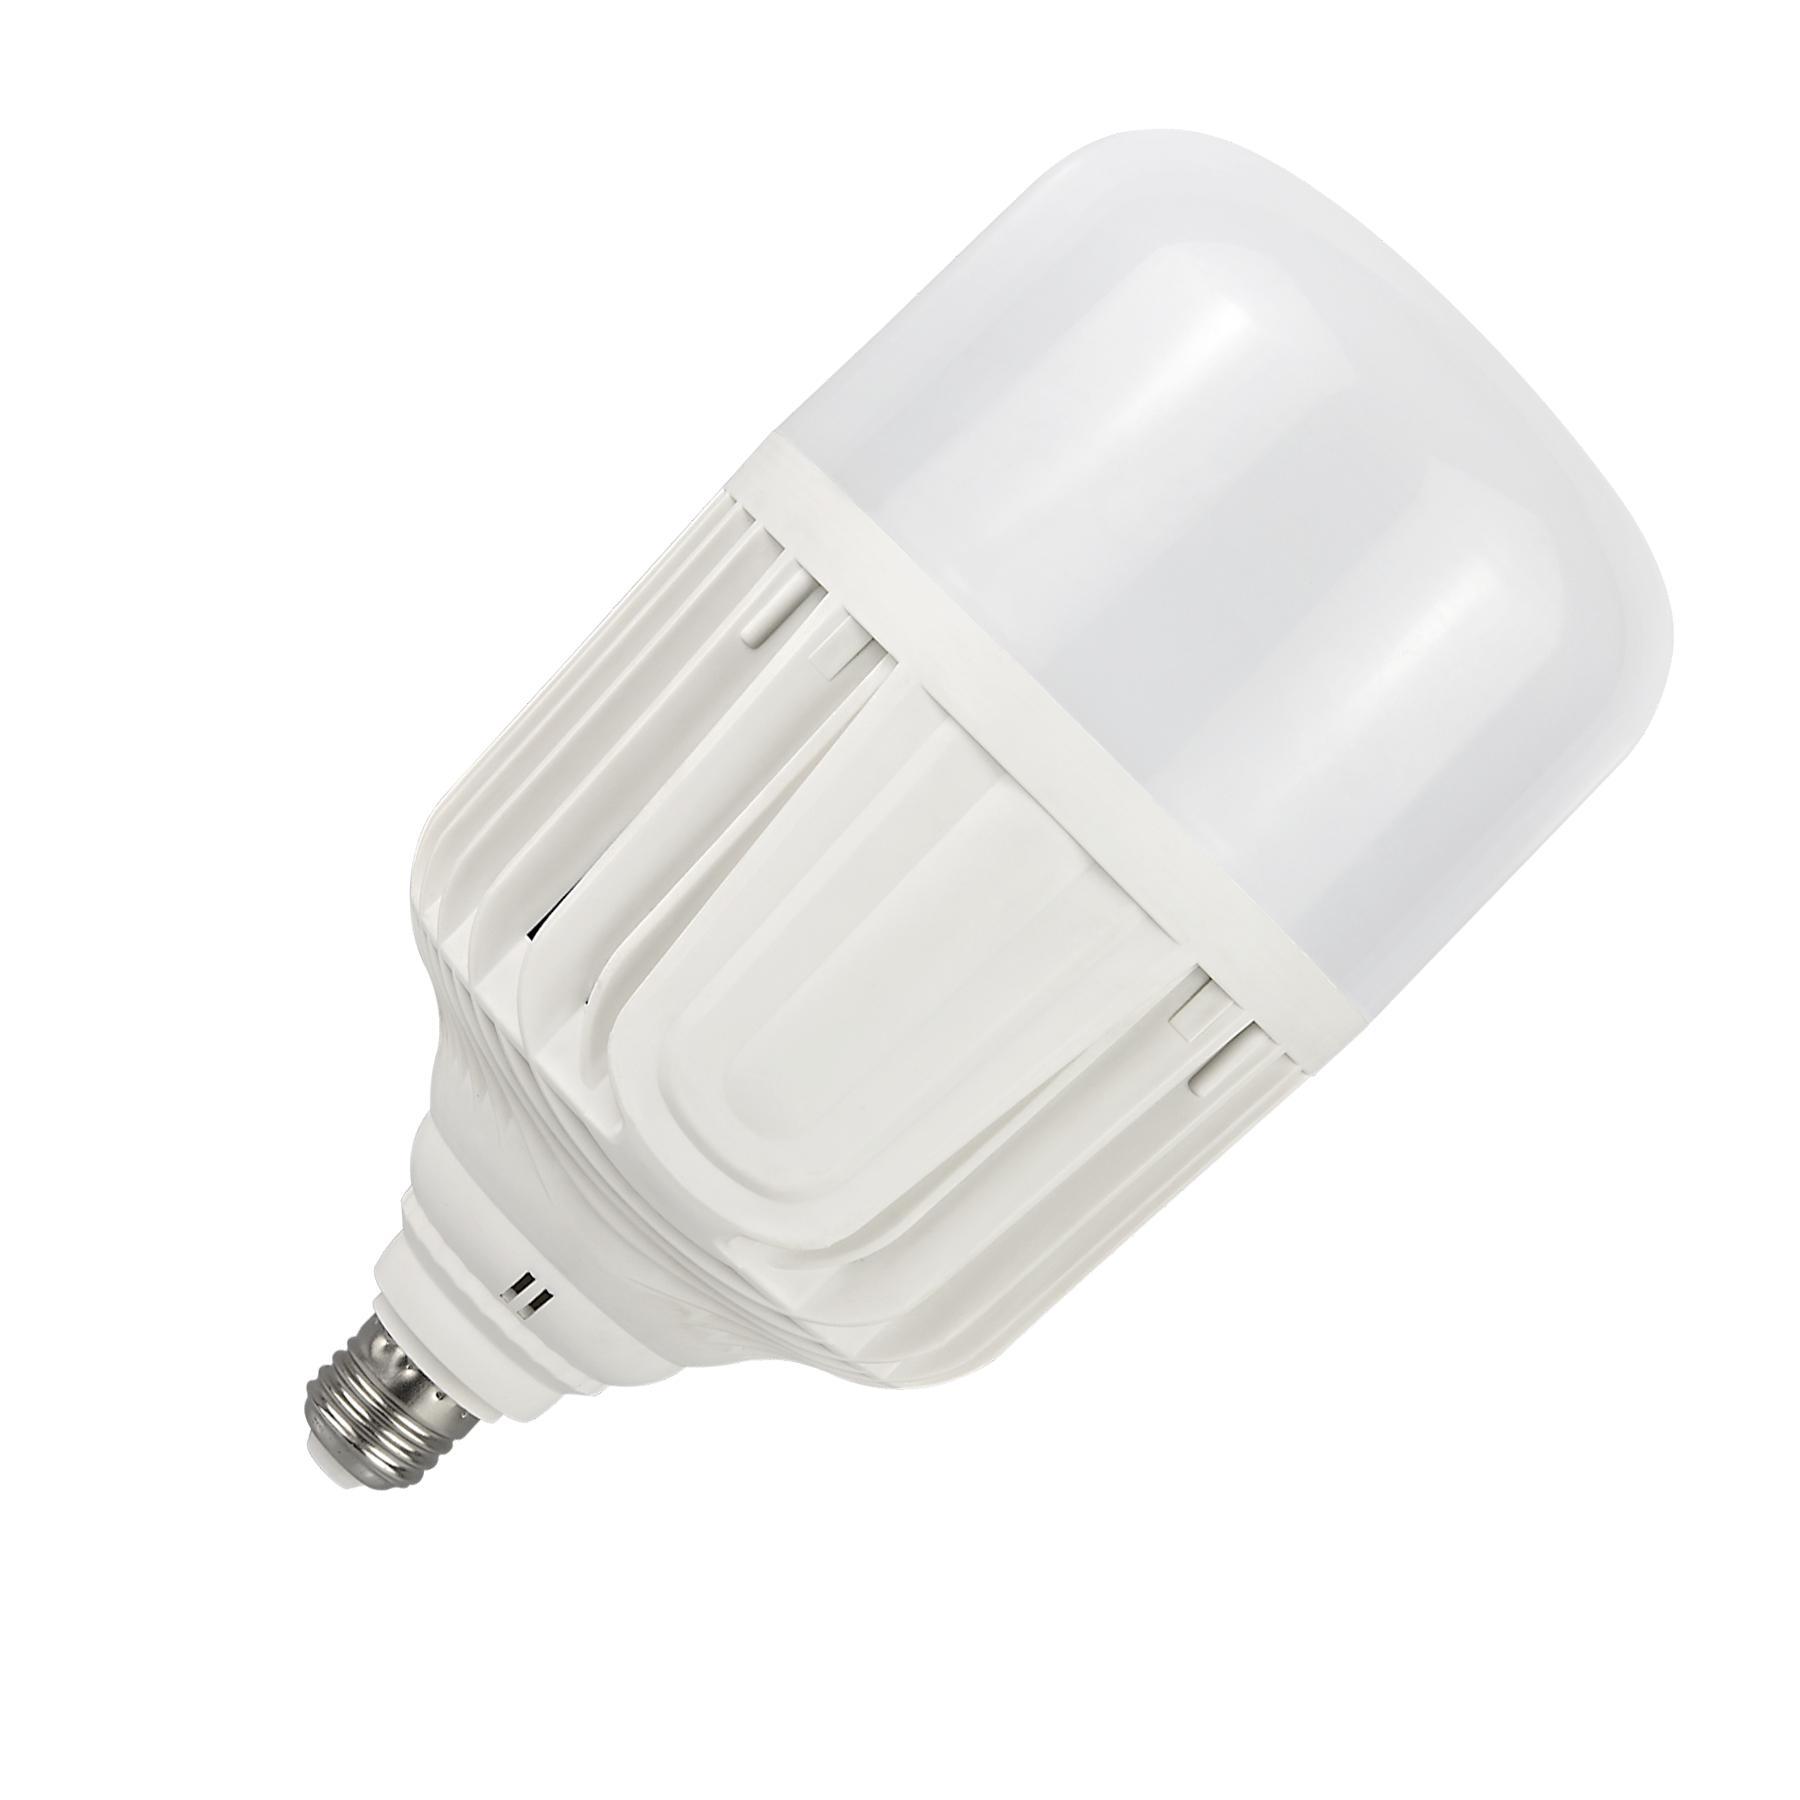 Лампа X-flash Xf-e40-t160-200w-4000k-230v полотенце вафельное с новым годом